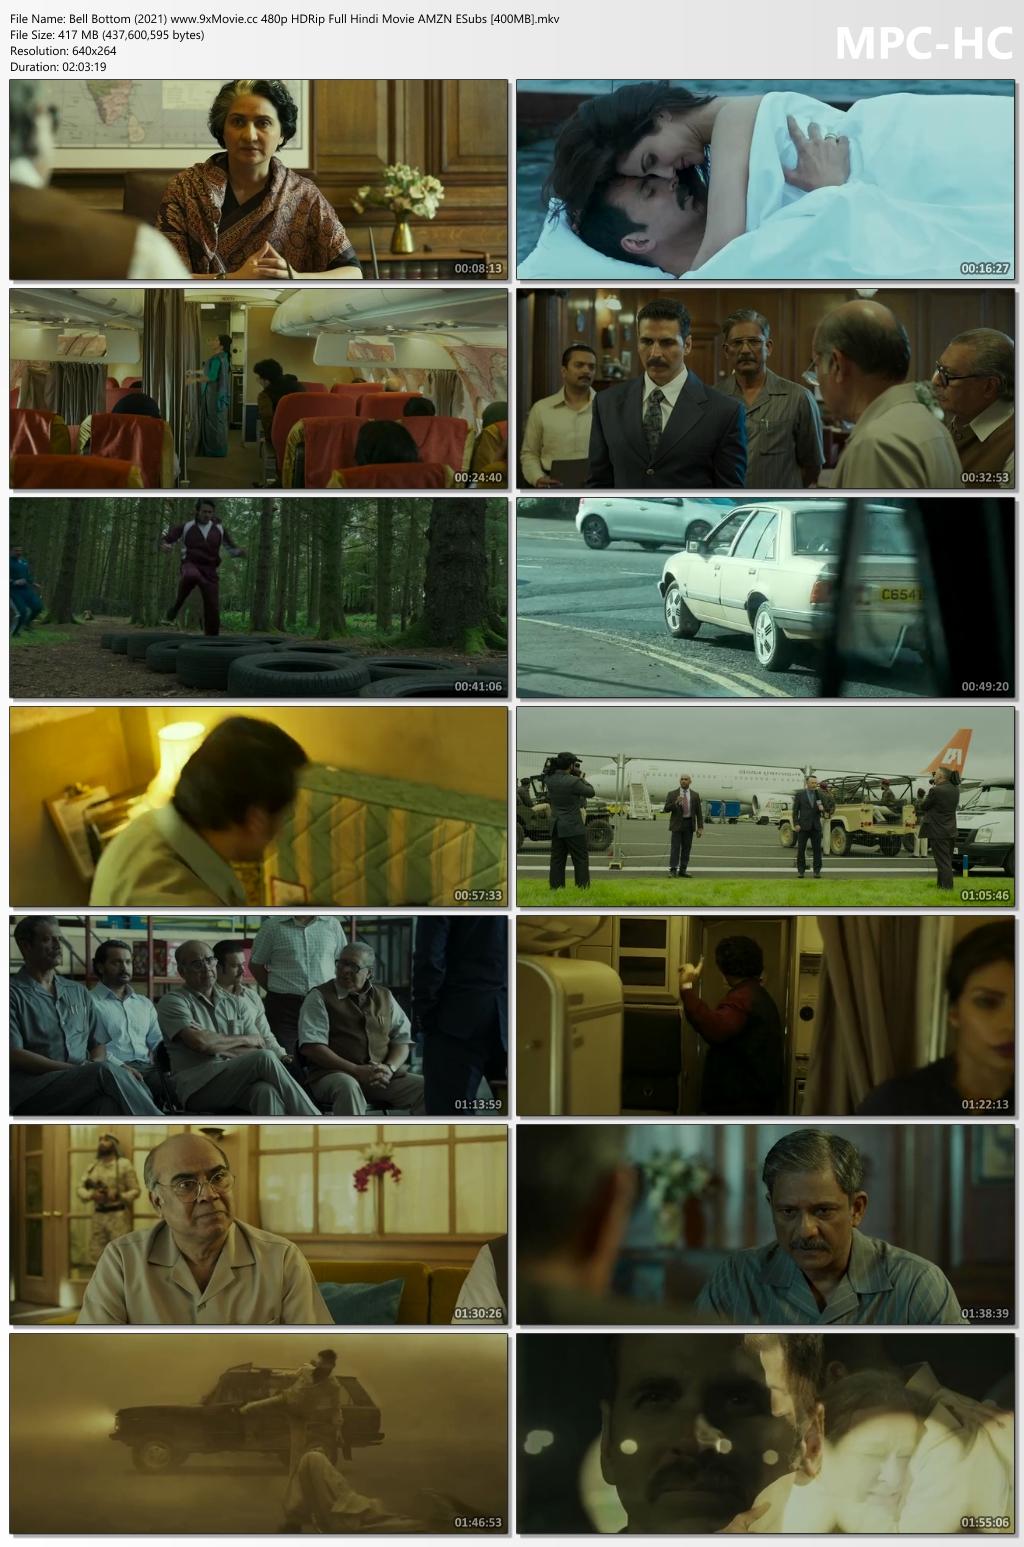 Bell-Bottom-2021-www-9x-Movie-cc-480p-HDRip-Full-Hindi-Movie-AMZN-ESubs-400-MB-mkv